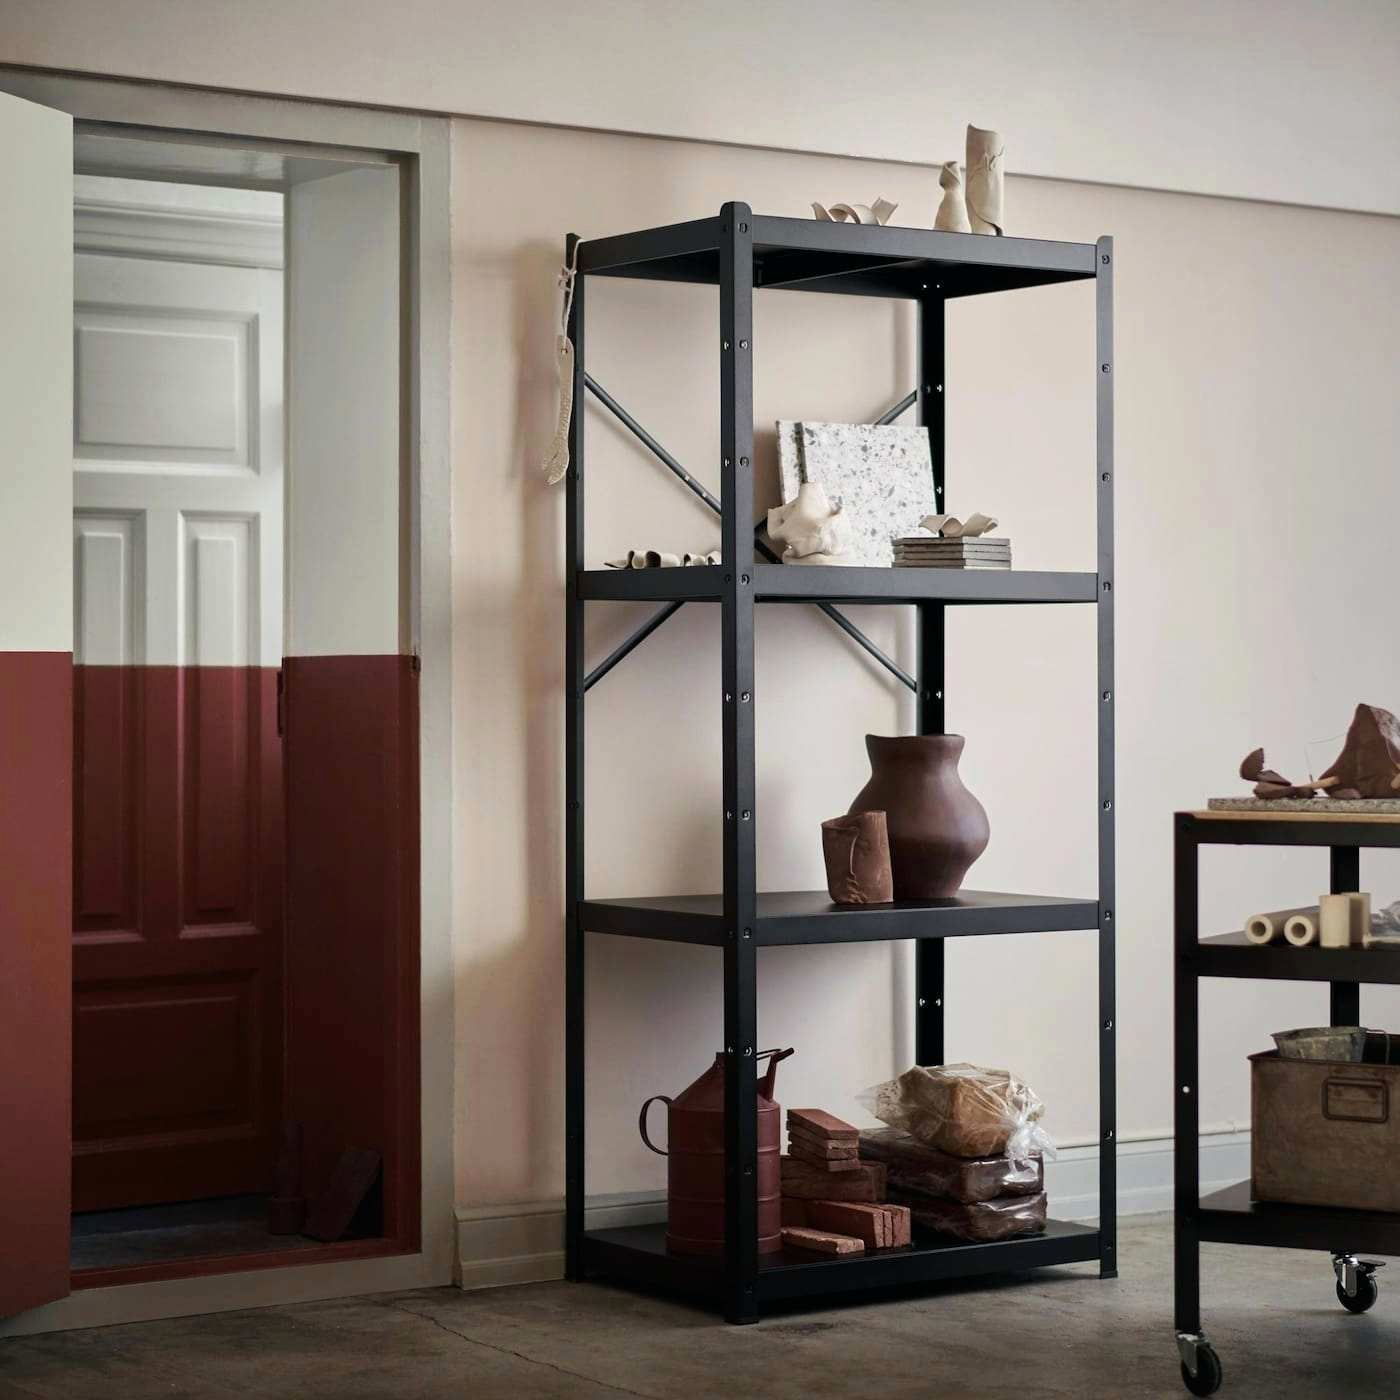 43 beliebt obi badezimmer aufbewahrung  ikea design home